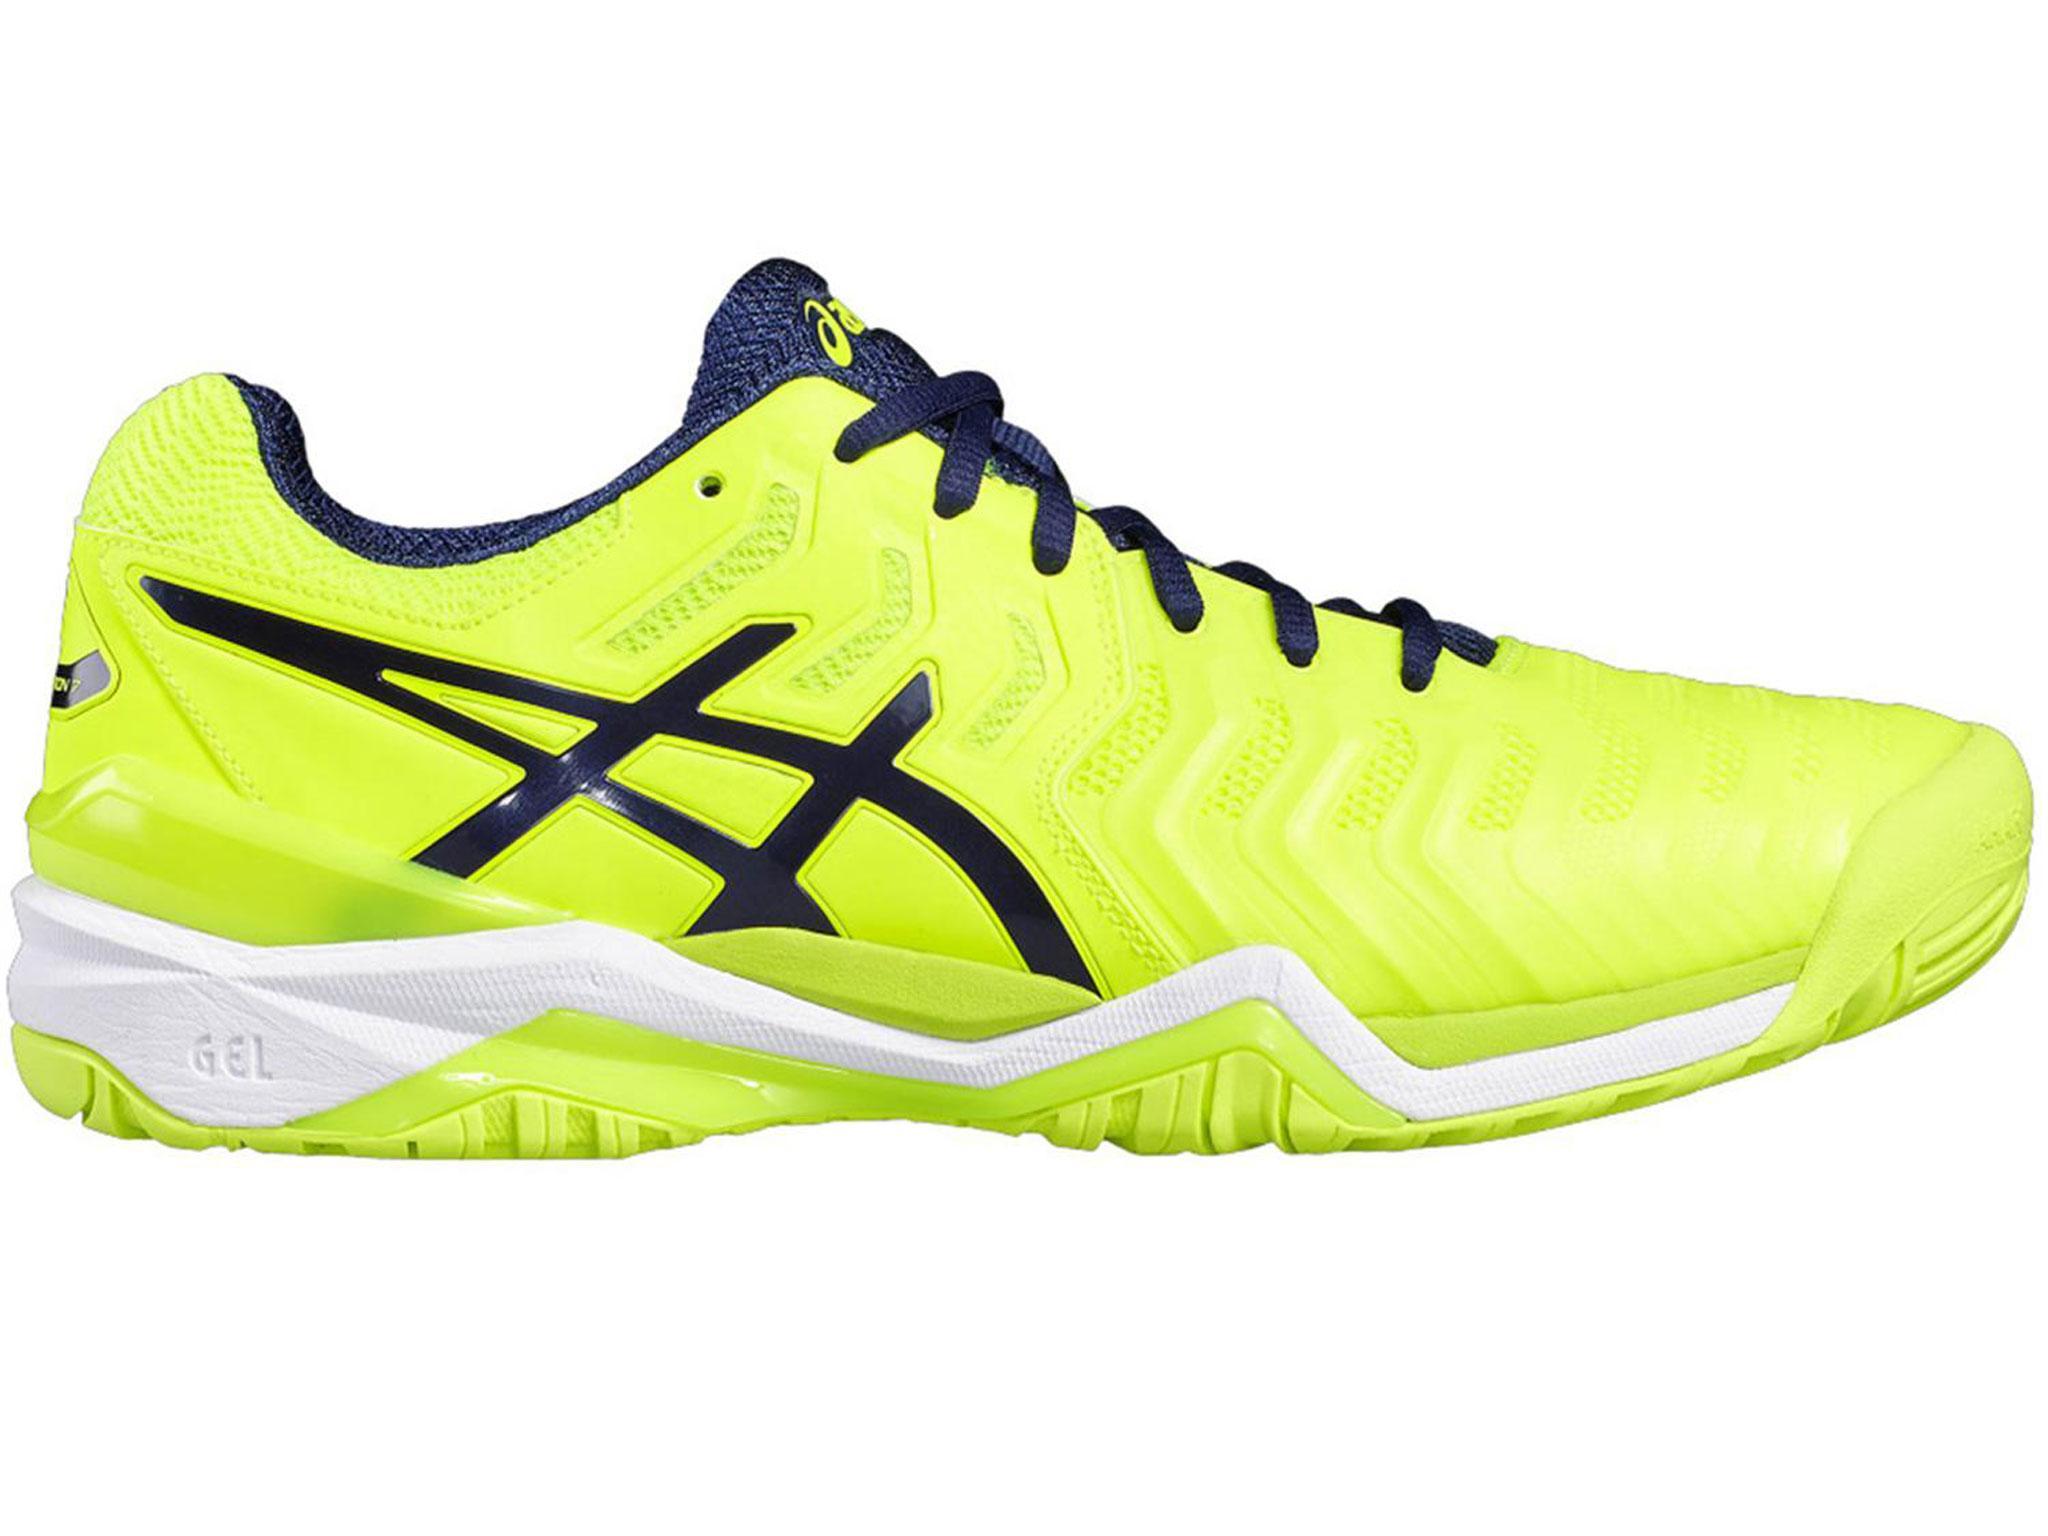 685bc7f43d42 Asics Gel Resolution 7 Tennis Shoes  £91.99